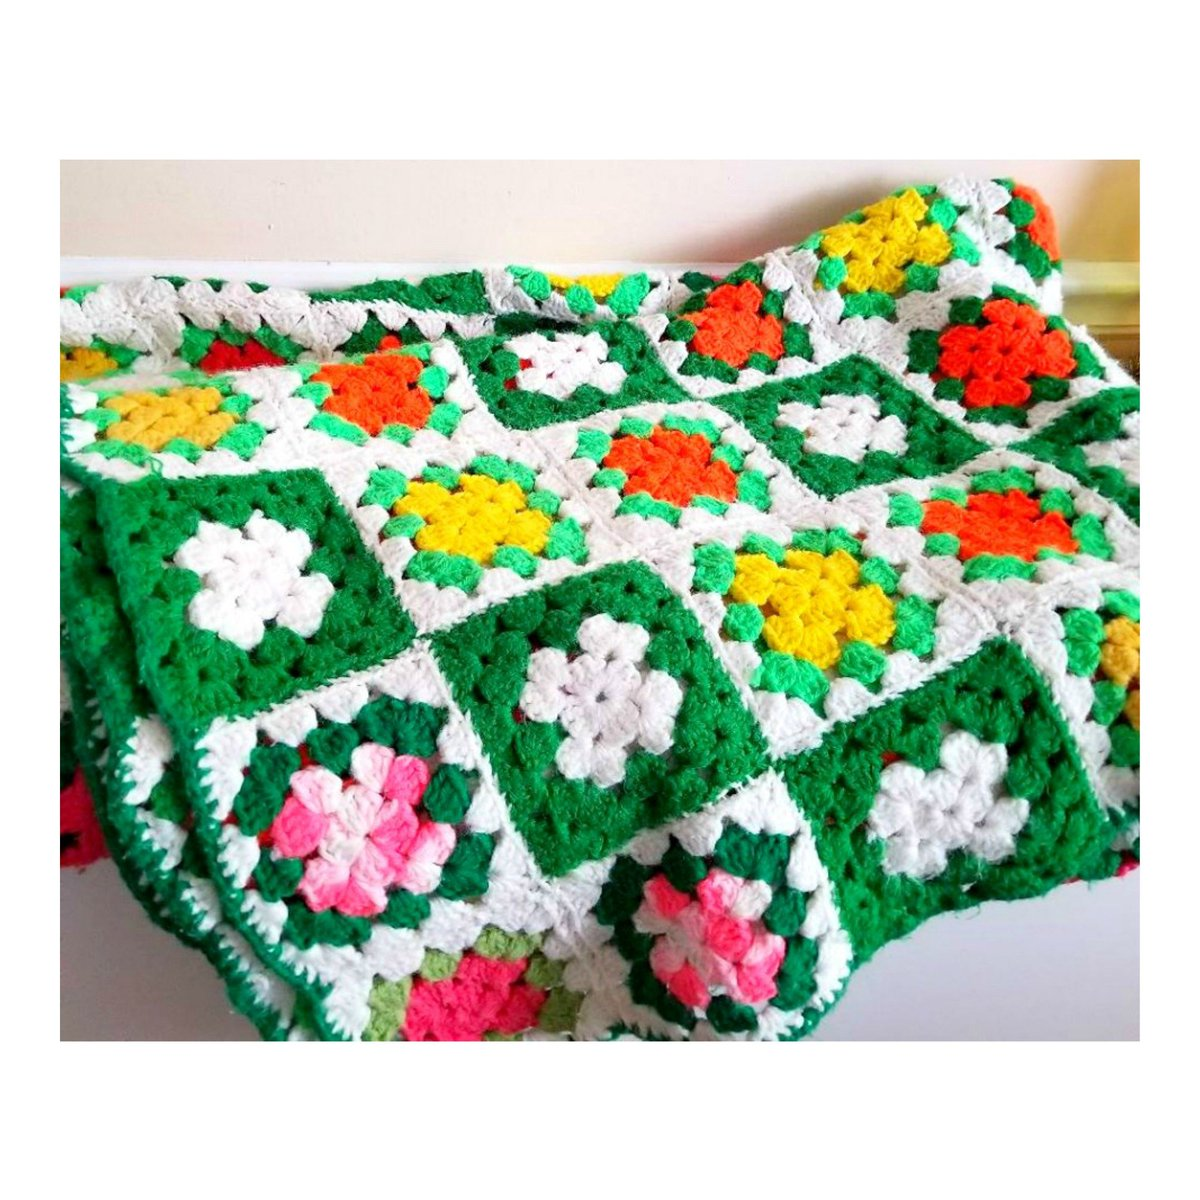 Vintage Handmade Crocheted Granny Square Afghan Throw Blanket, LARGE, 45 x 70 https://etsy.me/2MX8kiJ #housewares #bedroom #bedding #green #yellow #crochetafghan #neonblanket #kitschy #crochetedthrow